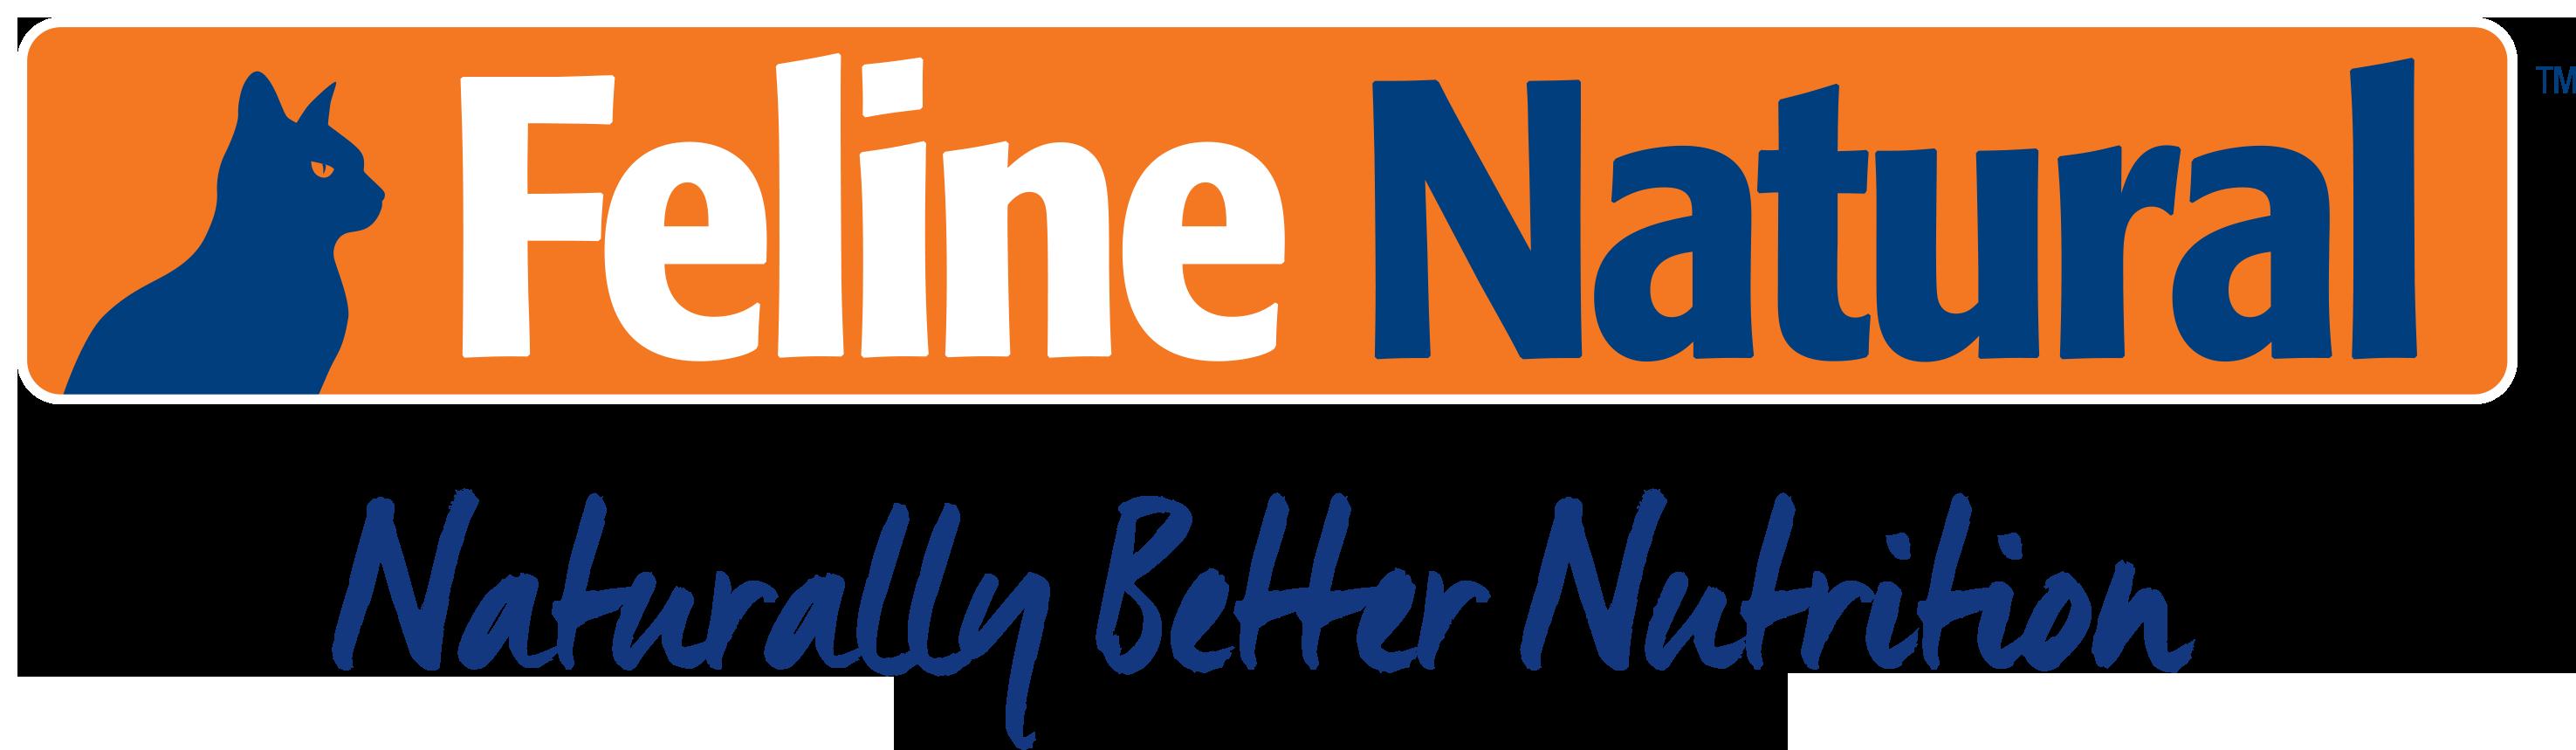 Feline-Natural-logo-vector-w-blue-NBN-30